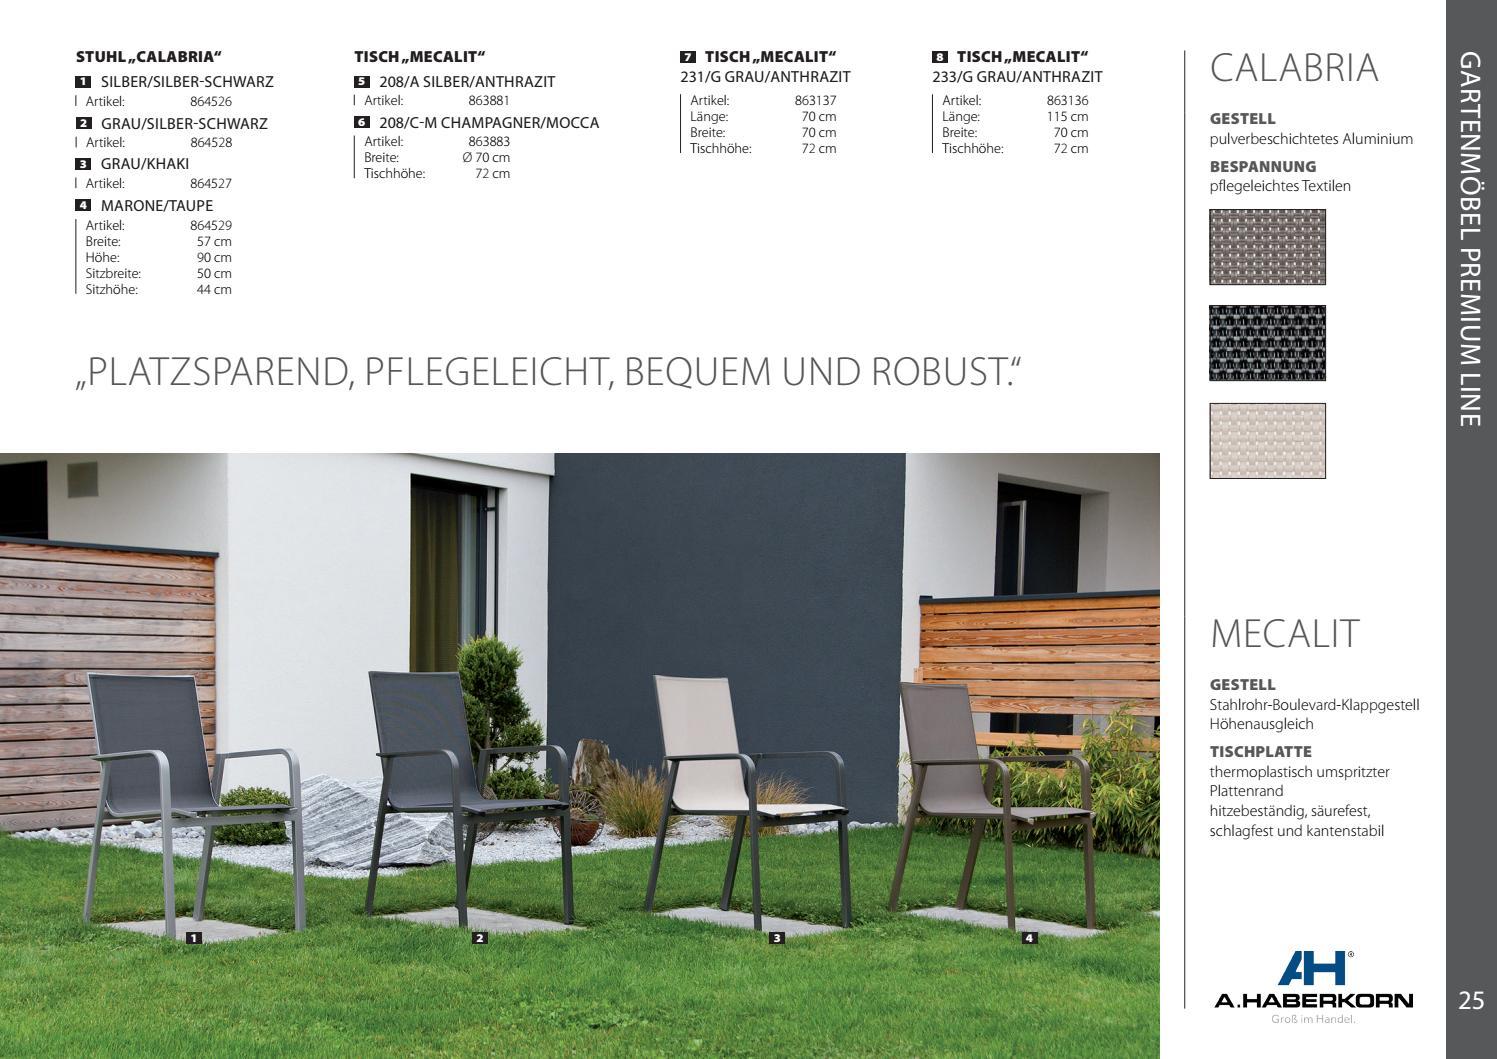 A. Haberkorn, Katalog Garten 2018 By Christof Neunteufel   Issuu